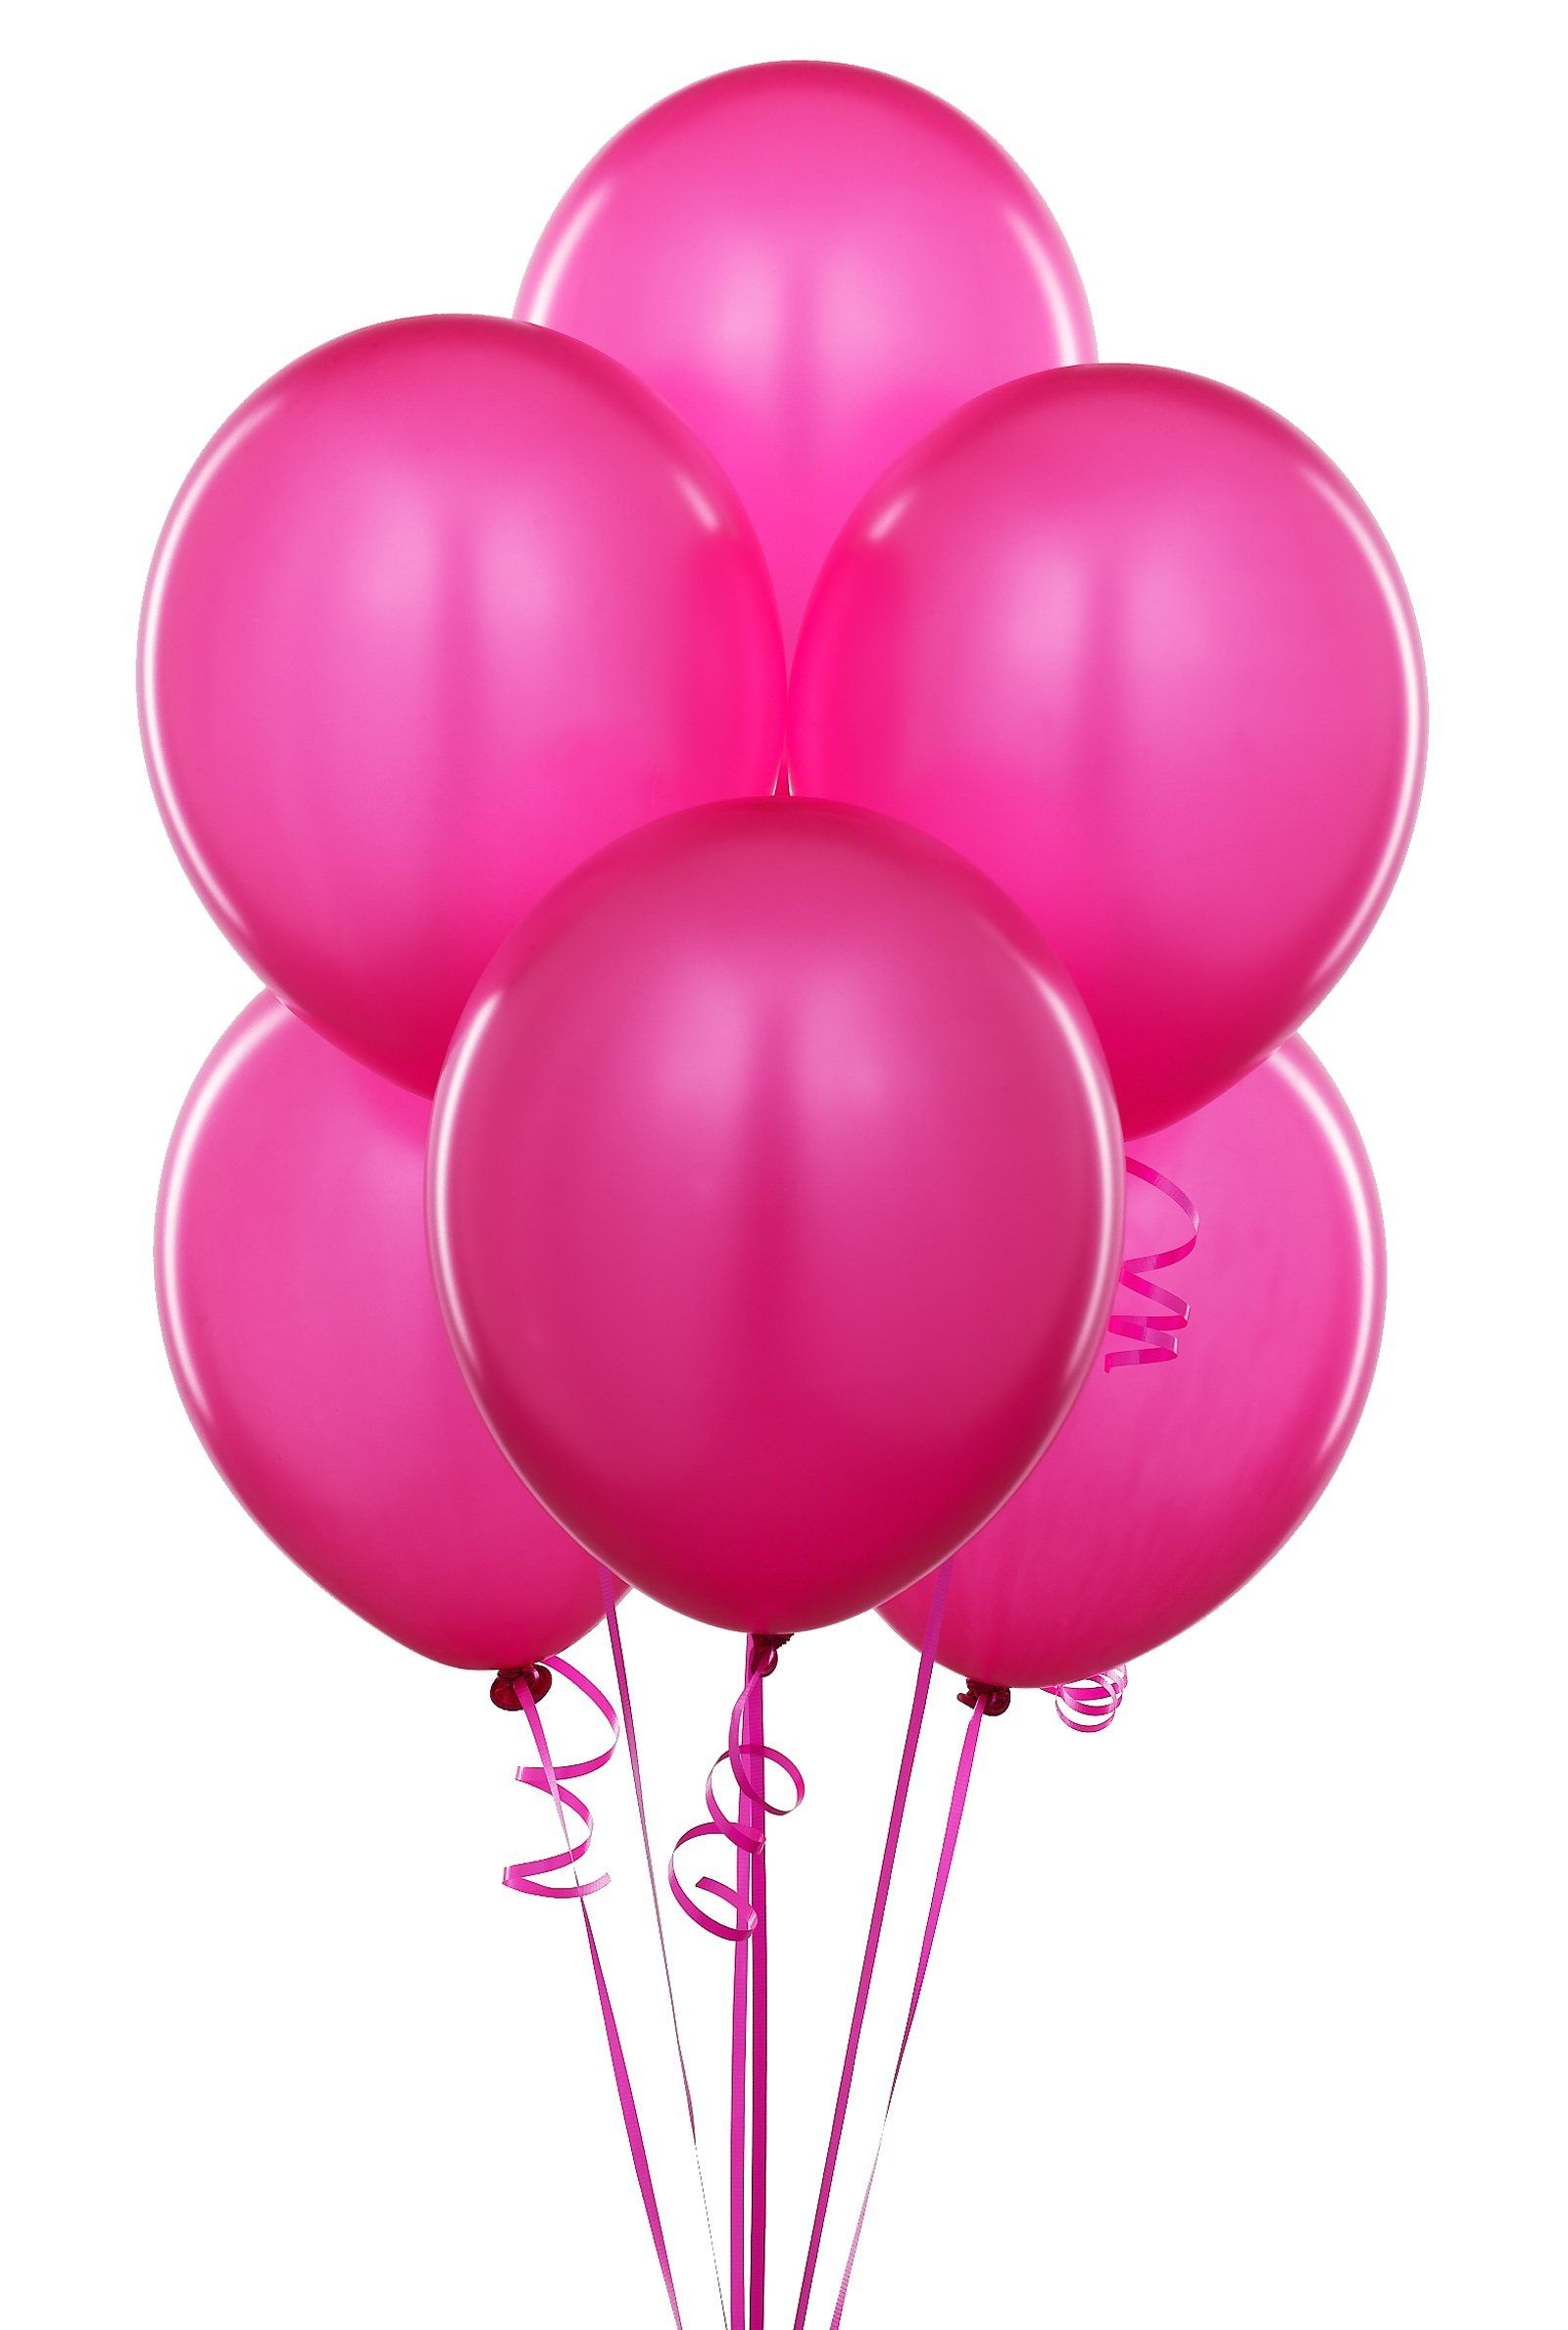 Hot Pink 12 Pcs - 12 | PiNK | Pinterest | Hot pink, Pink pink pink ...